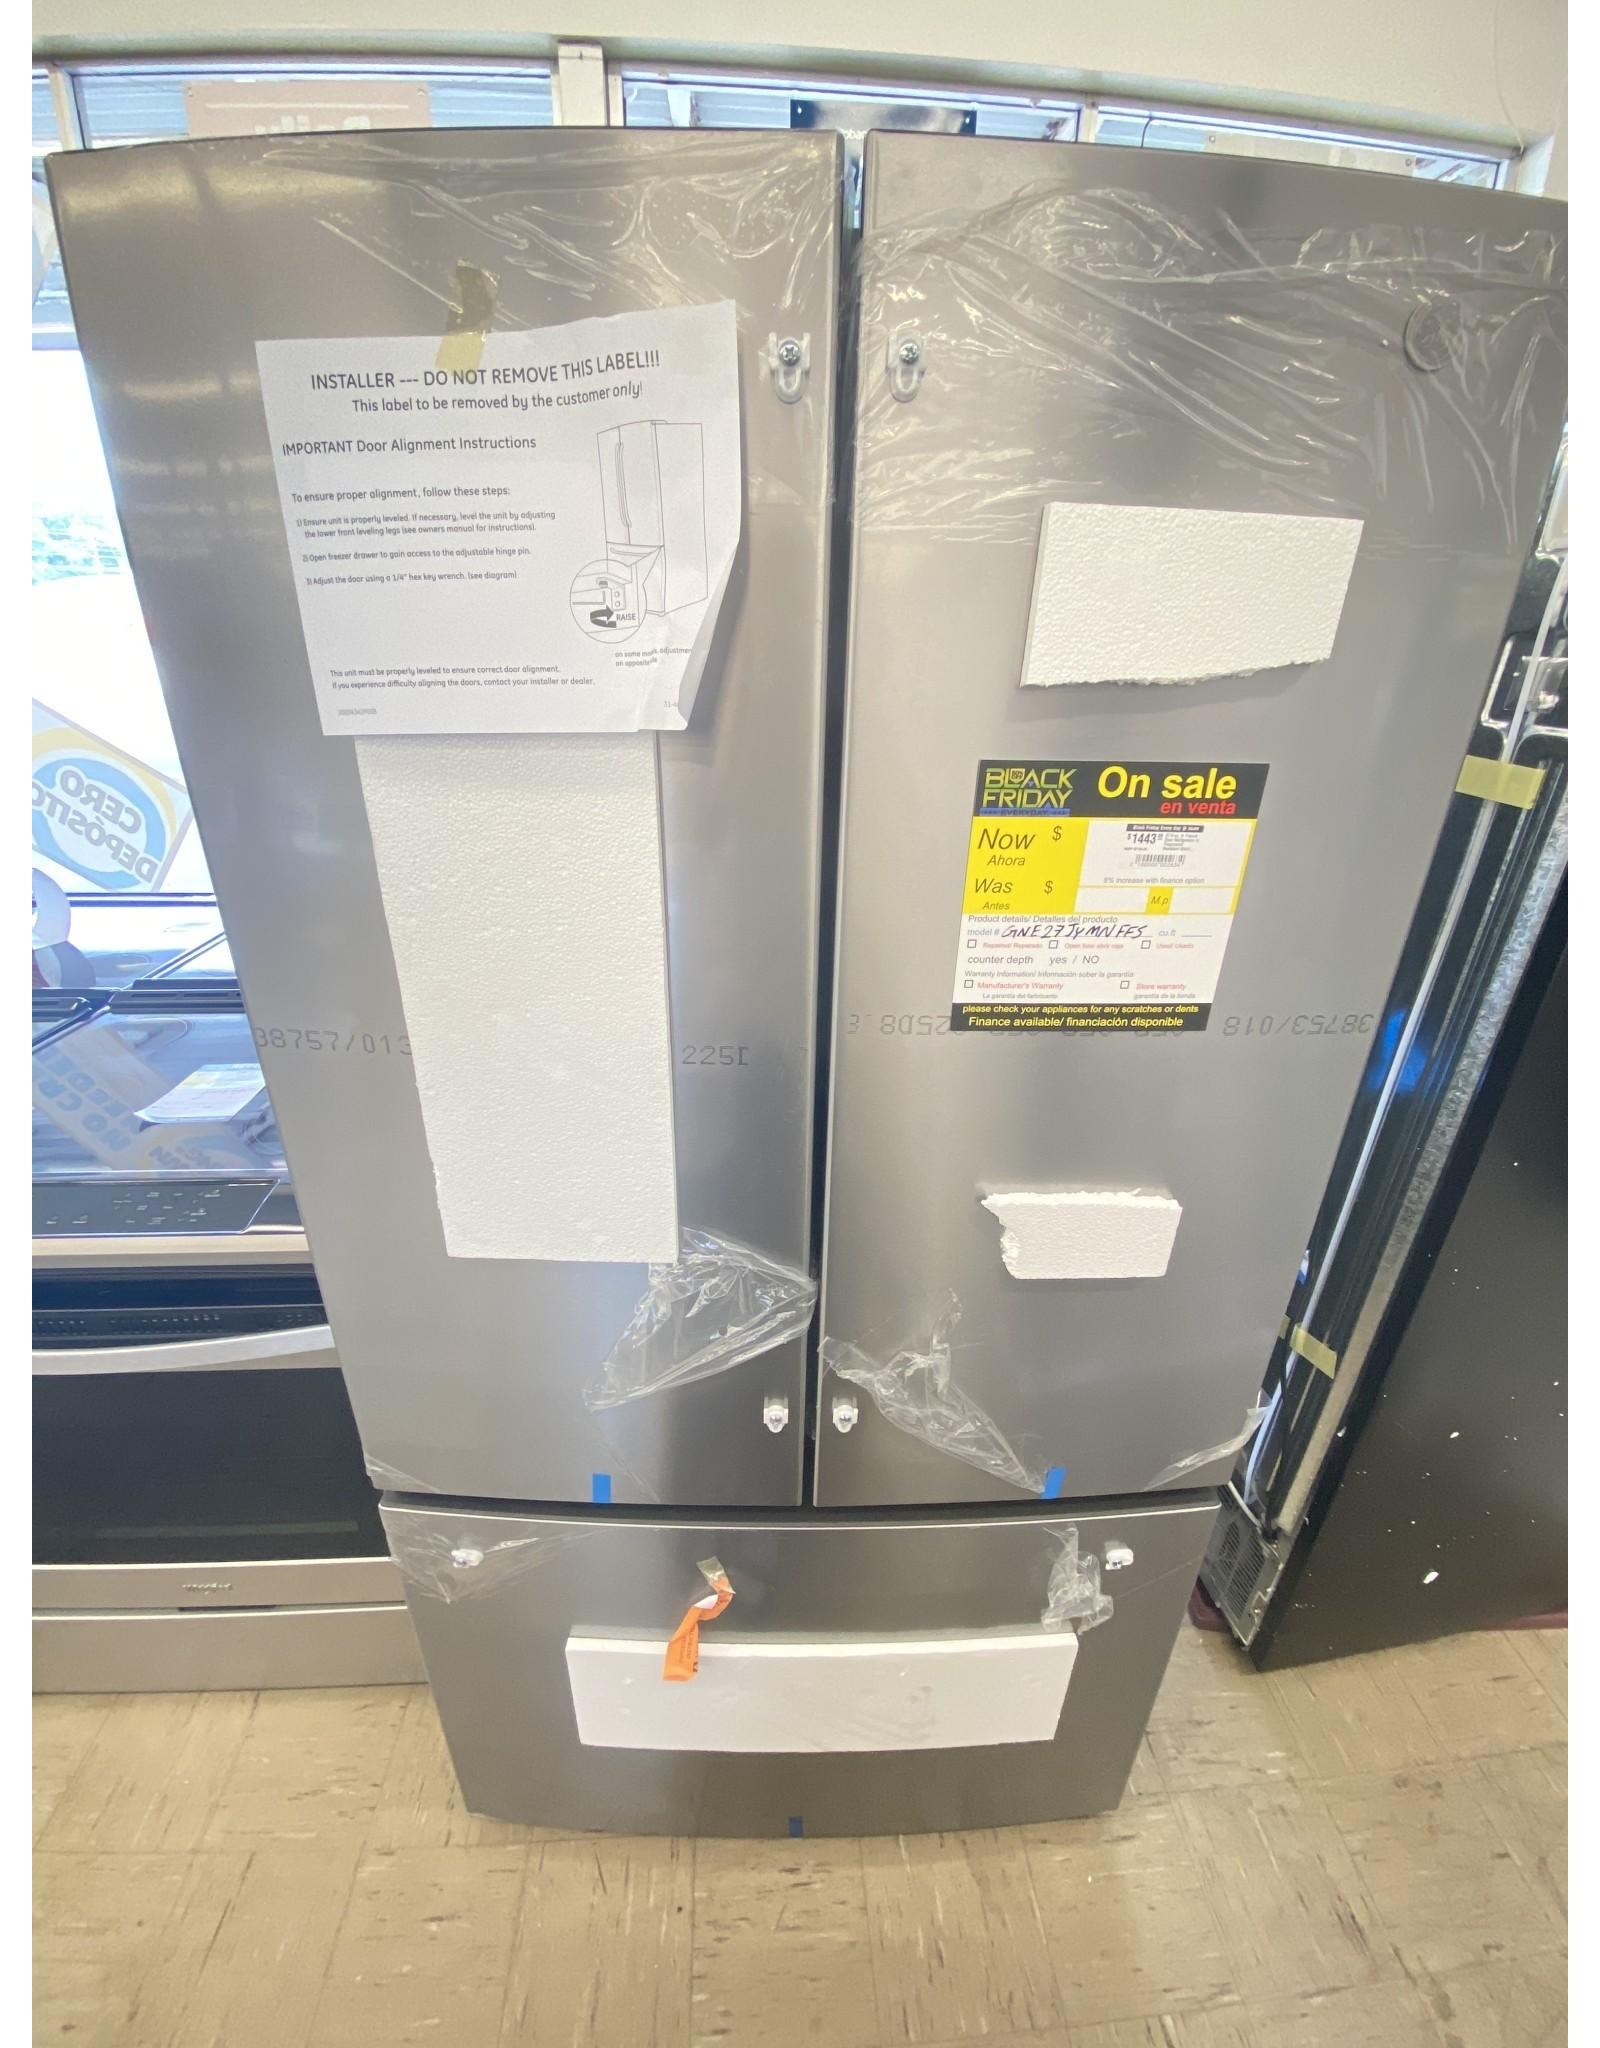 GE 27.0 cu. ft. French Door Refrigerator in Fingerprint Resistant Stainless Steel, ENERGY STAR